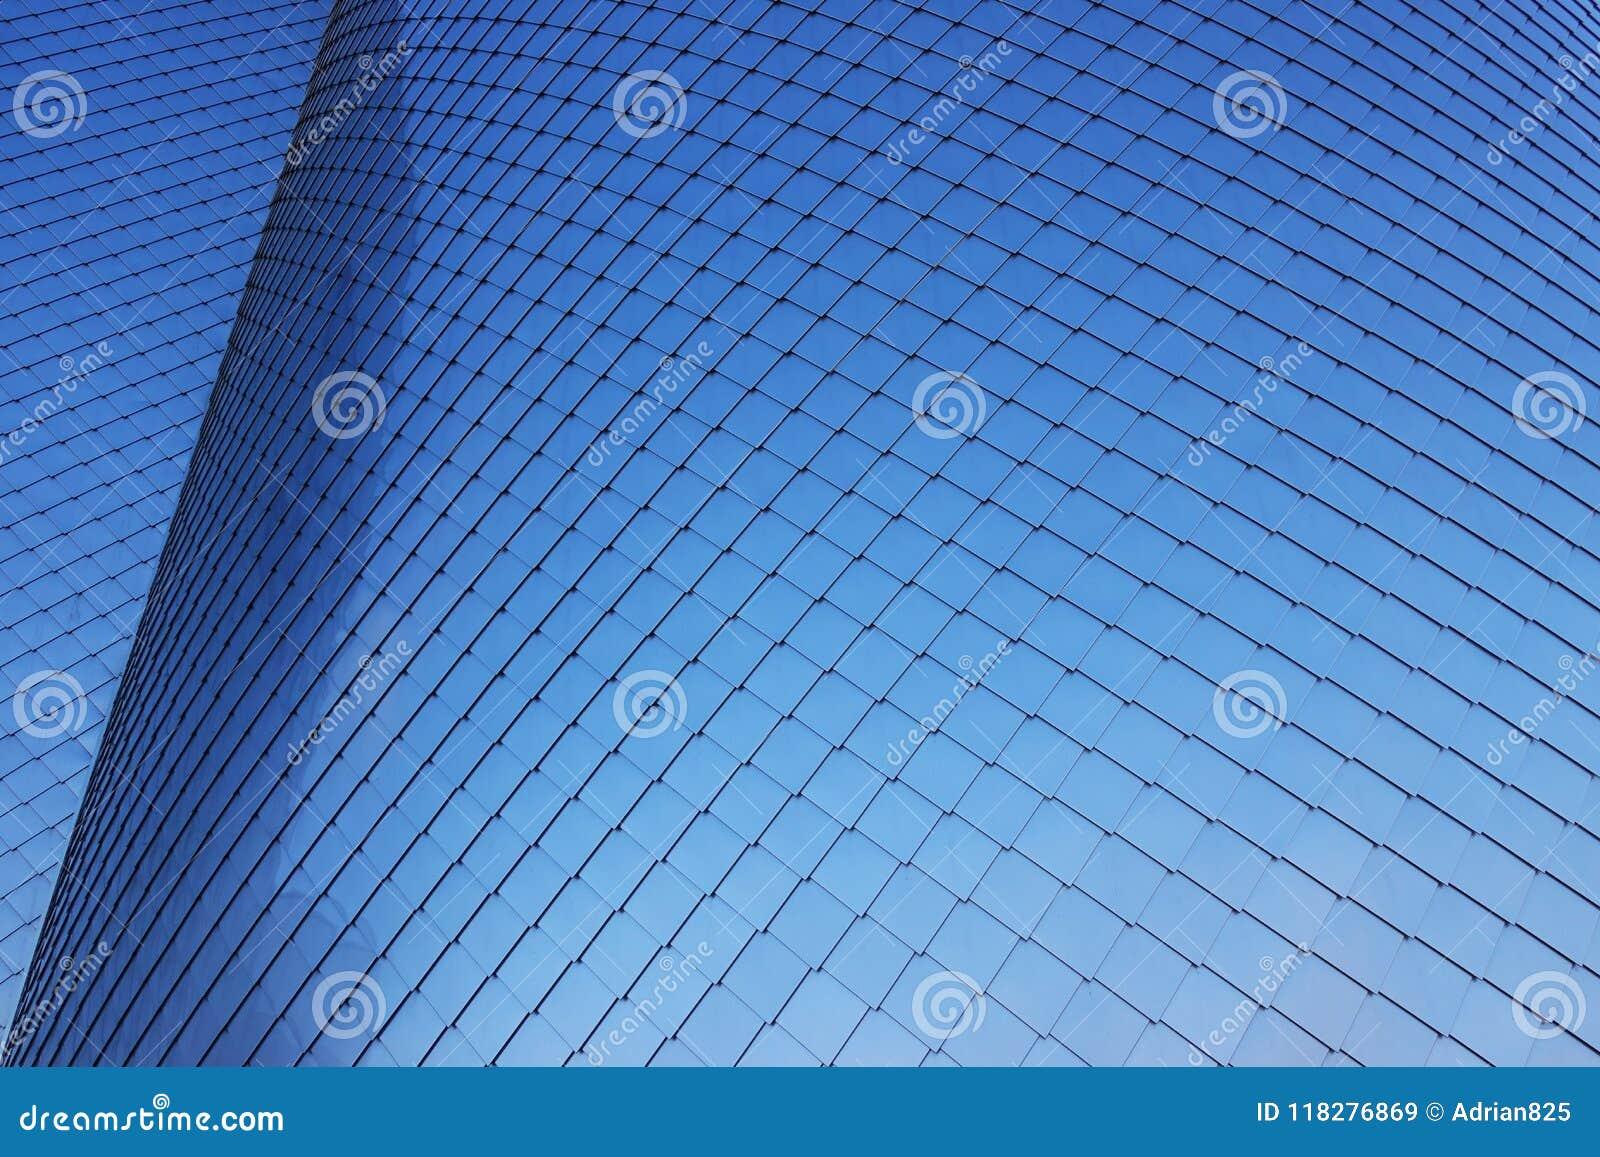 Aluminium façade as abstract background or texture